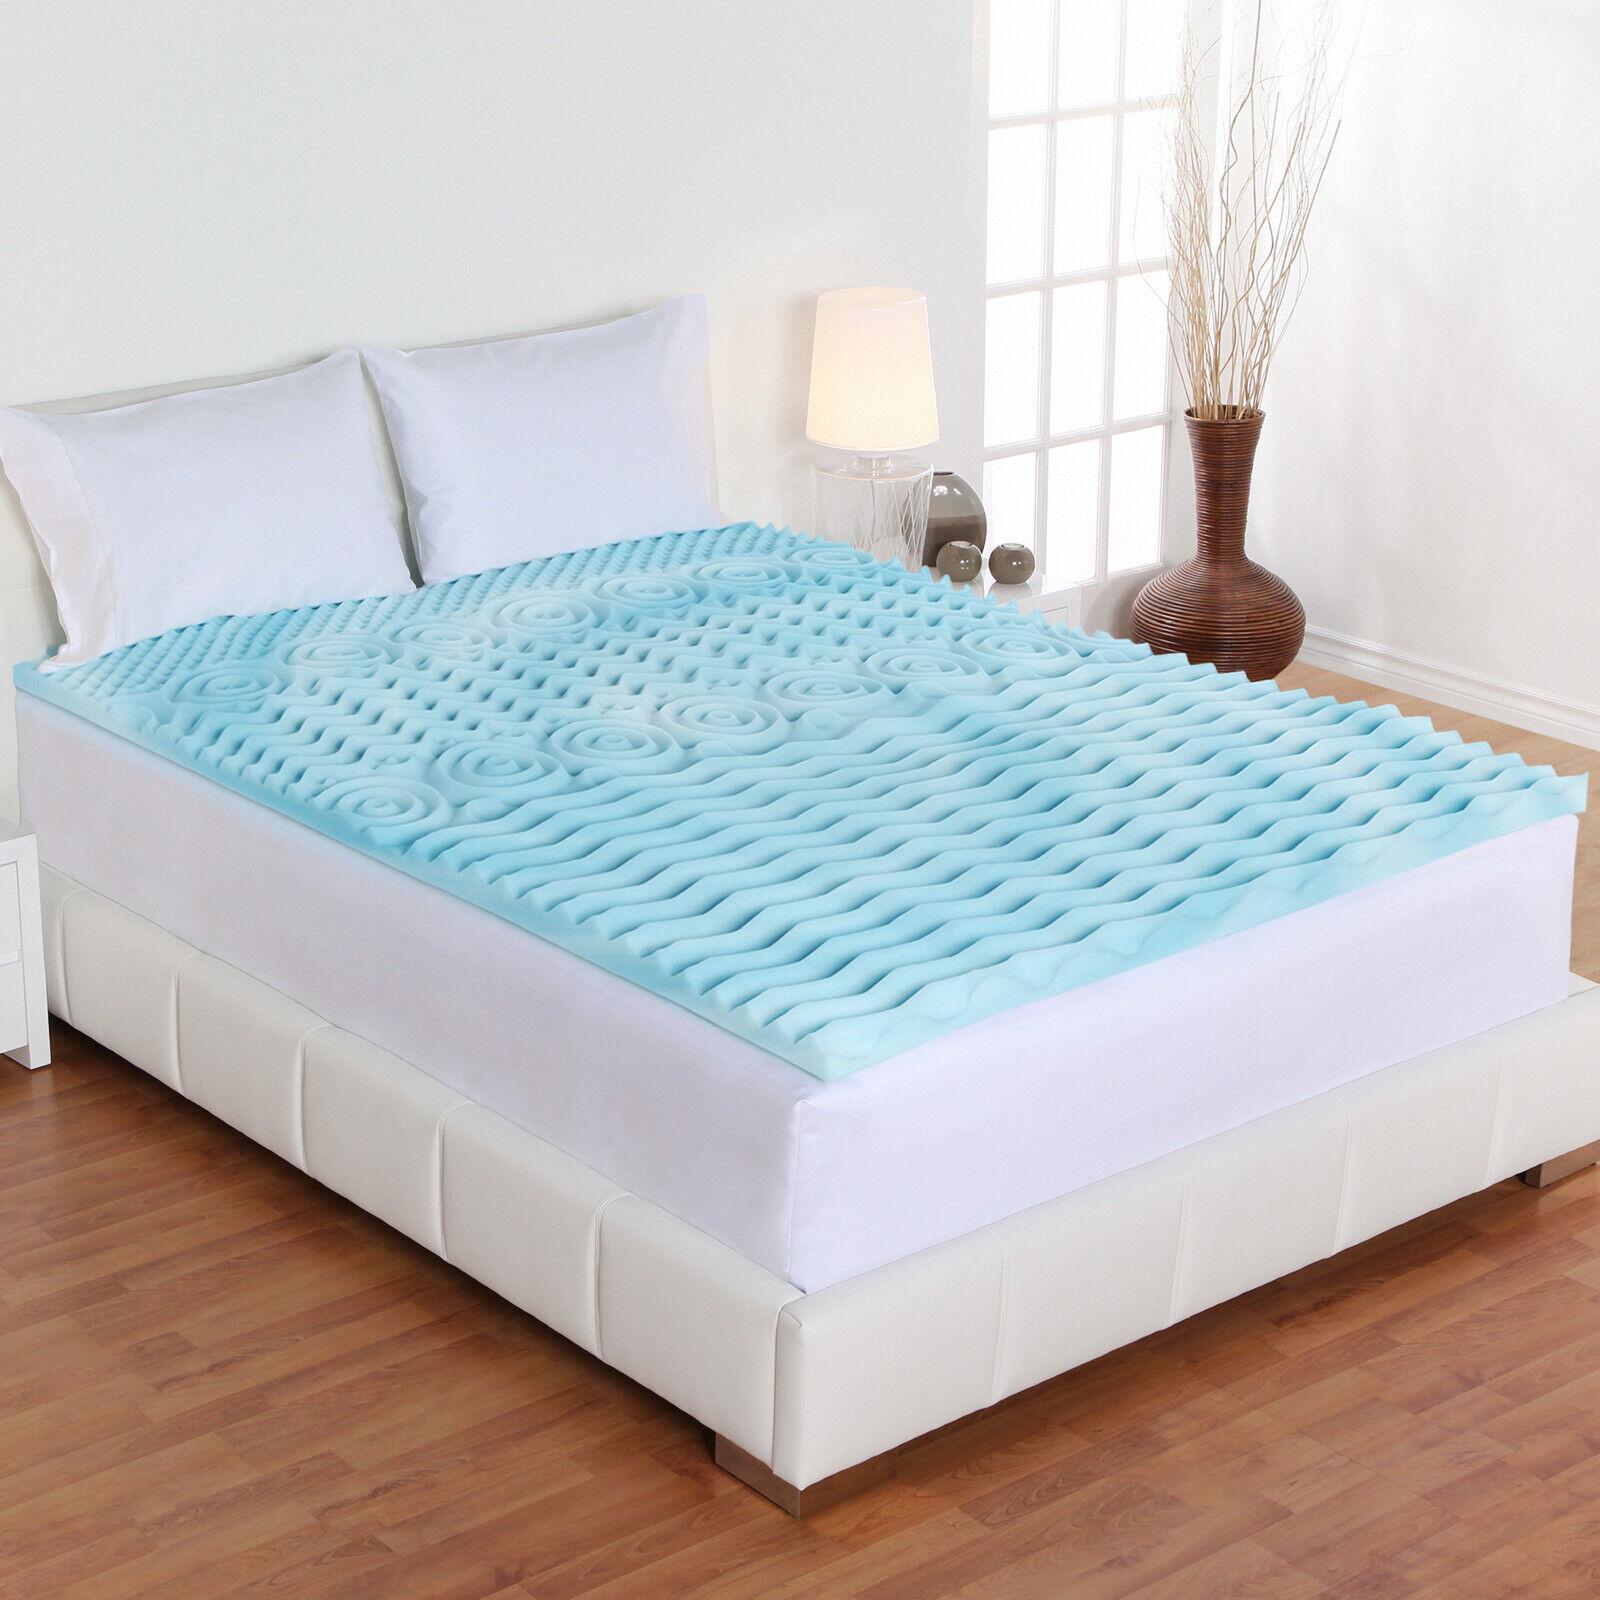 Cooling Gel Mattress Topper Memory Foam Orthopedic King Bed